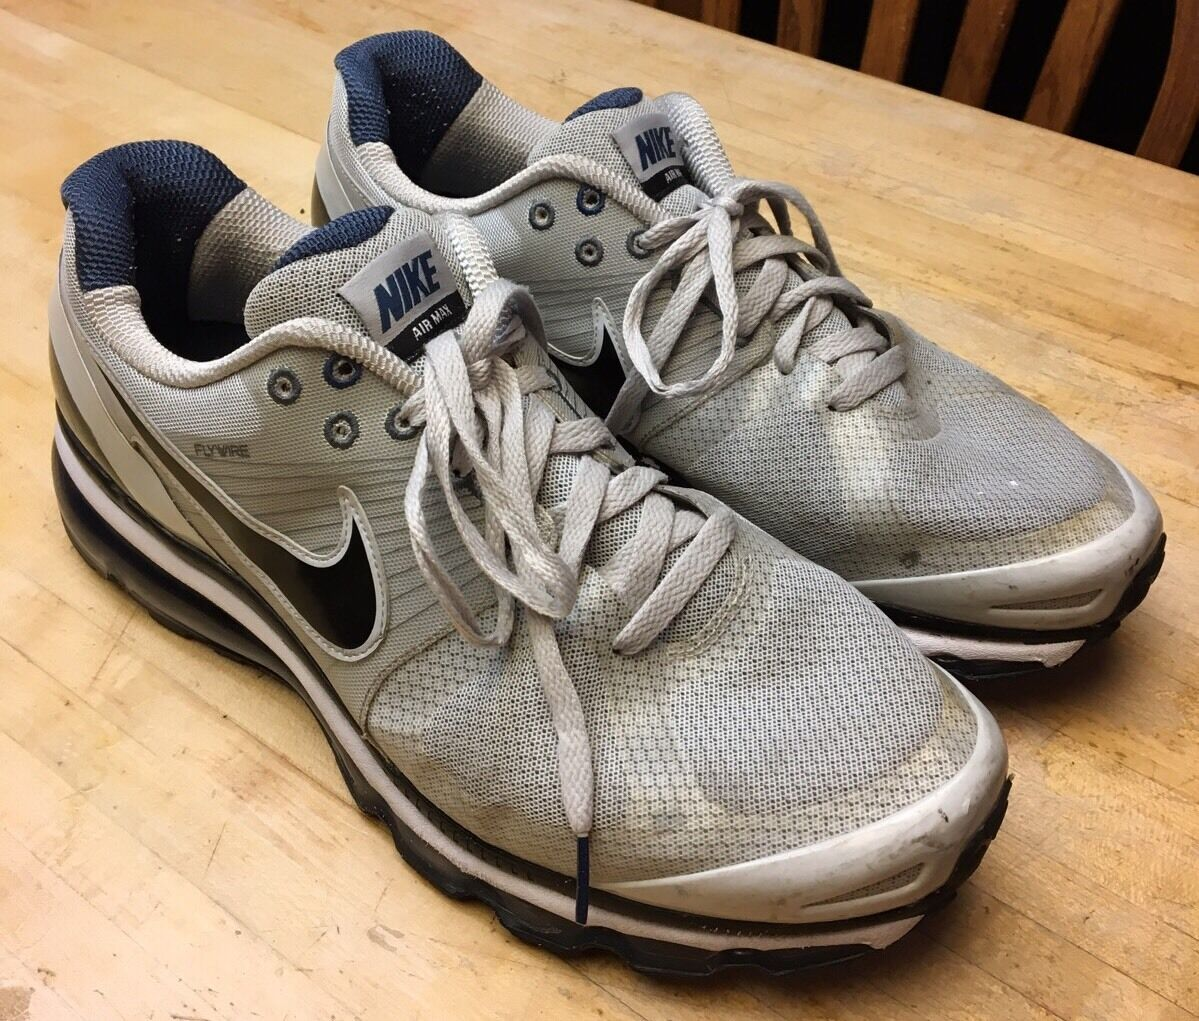 RARE Mens Nike Air Gray Max 2010 Gray Air Starlight White Black Shoes 386368-015 Size 13 d4fa3e